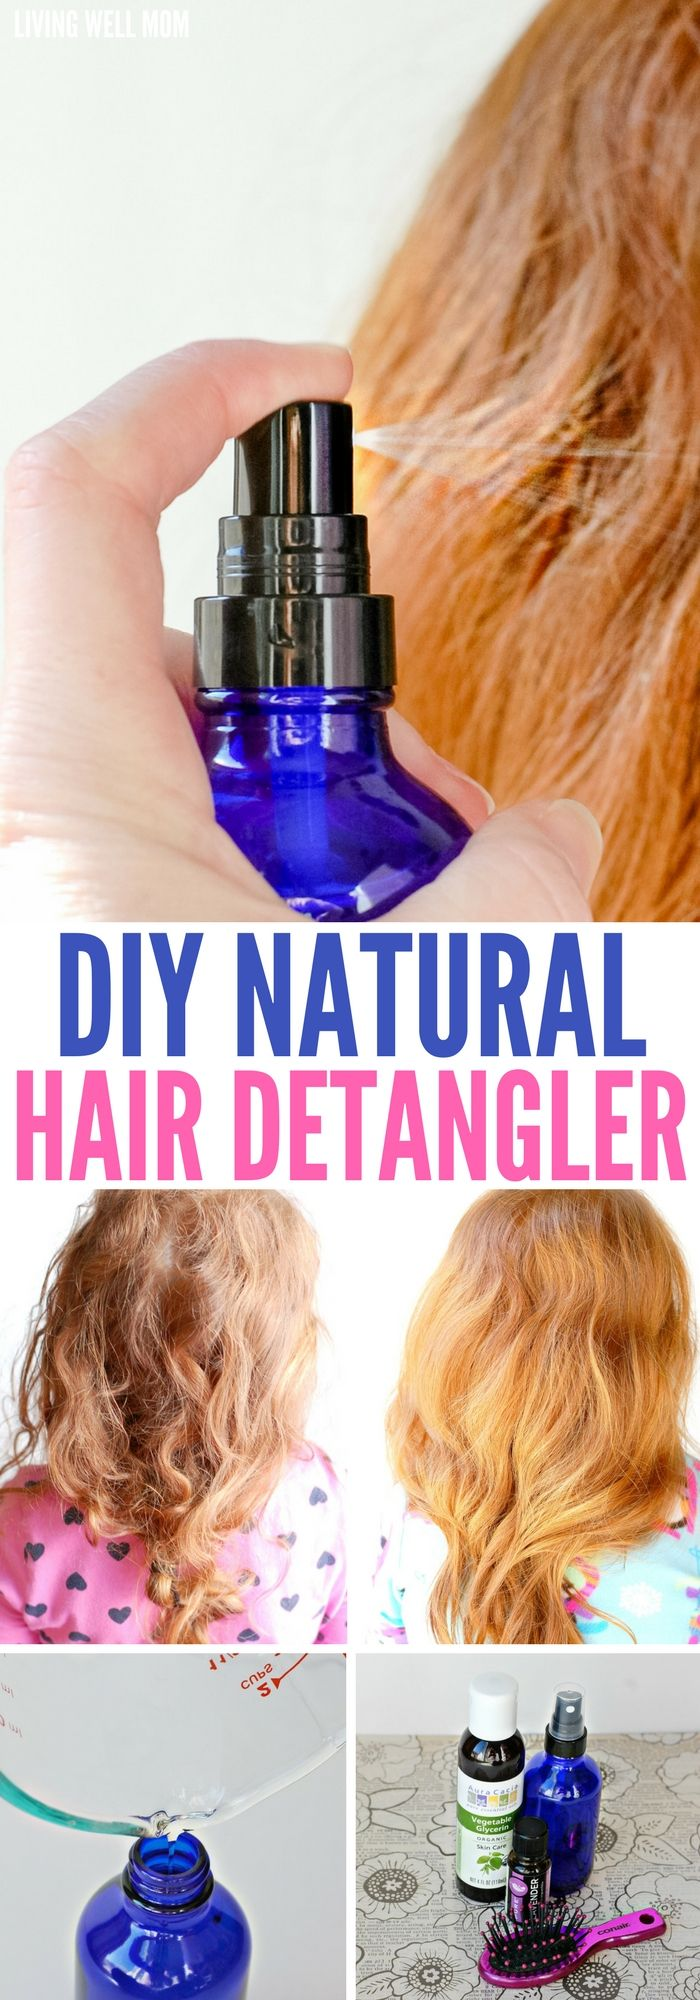 Diy Natural Hair Detangler With Essential Oils Hair Detangler Natural Hair Diy Diy Hair Detangler